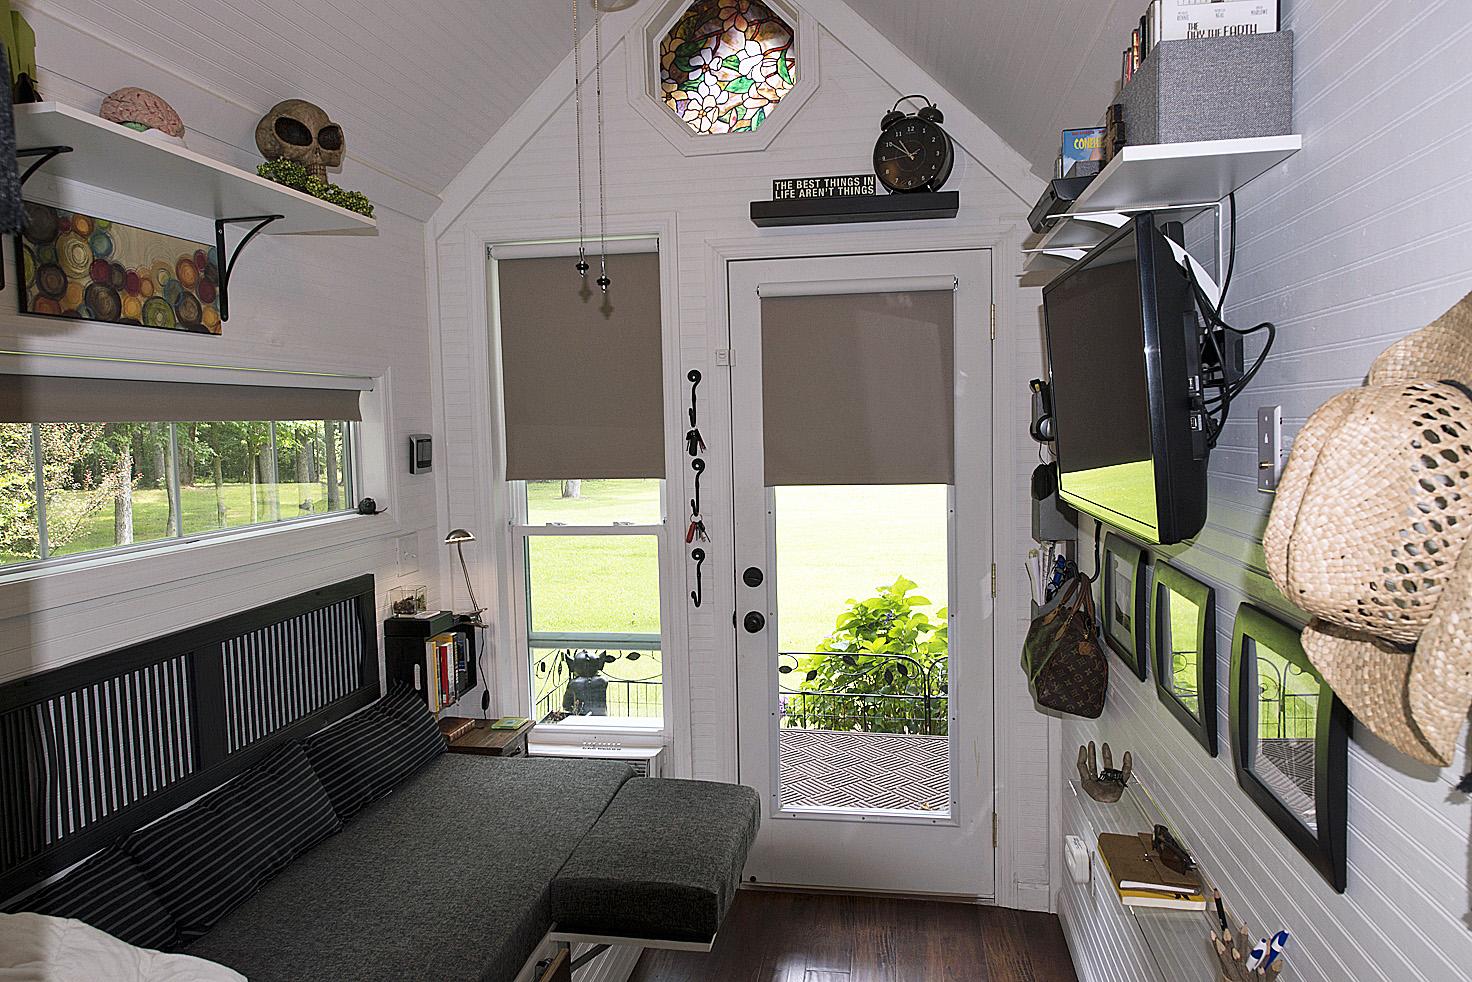 Tiny Home Designs: TINY HOUSE TOWN: Mendy's Tiny Home (128 Sq Ft